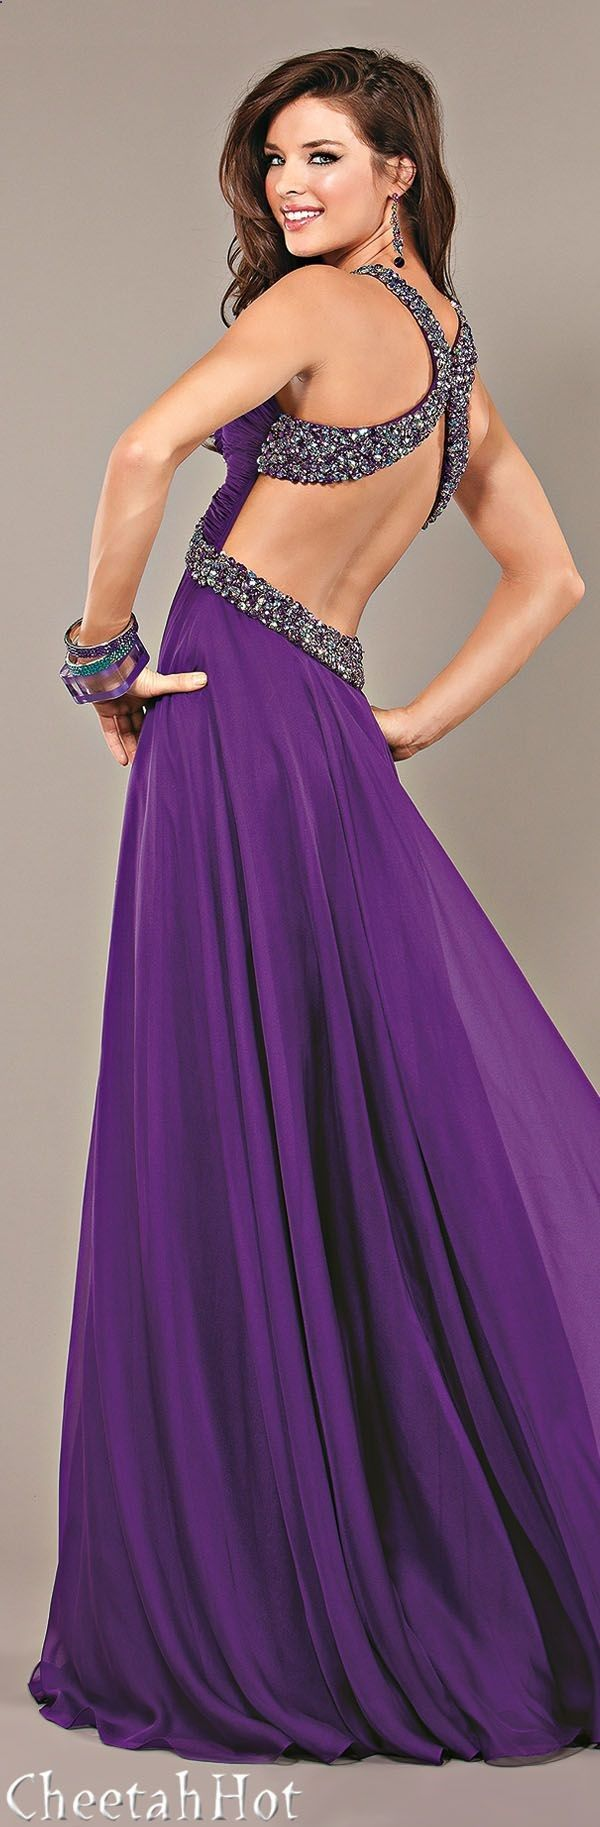 JOVANI - Gorgeous Gown | Cosas que me gusta | Pinterest | Me gustas ...